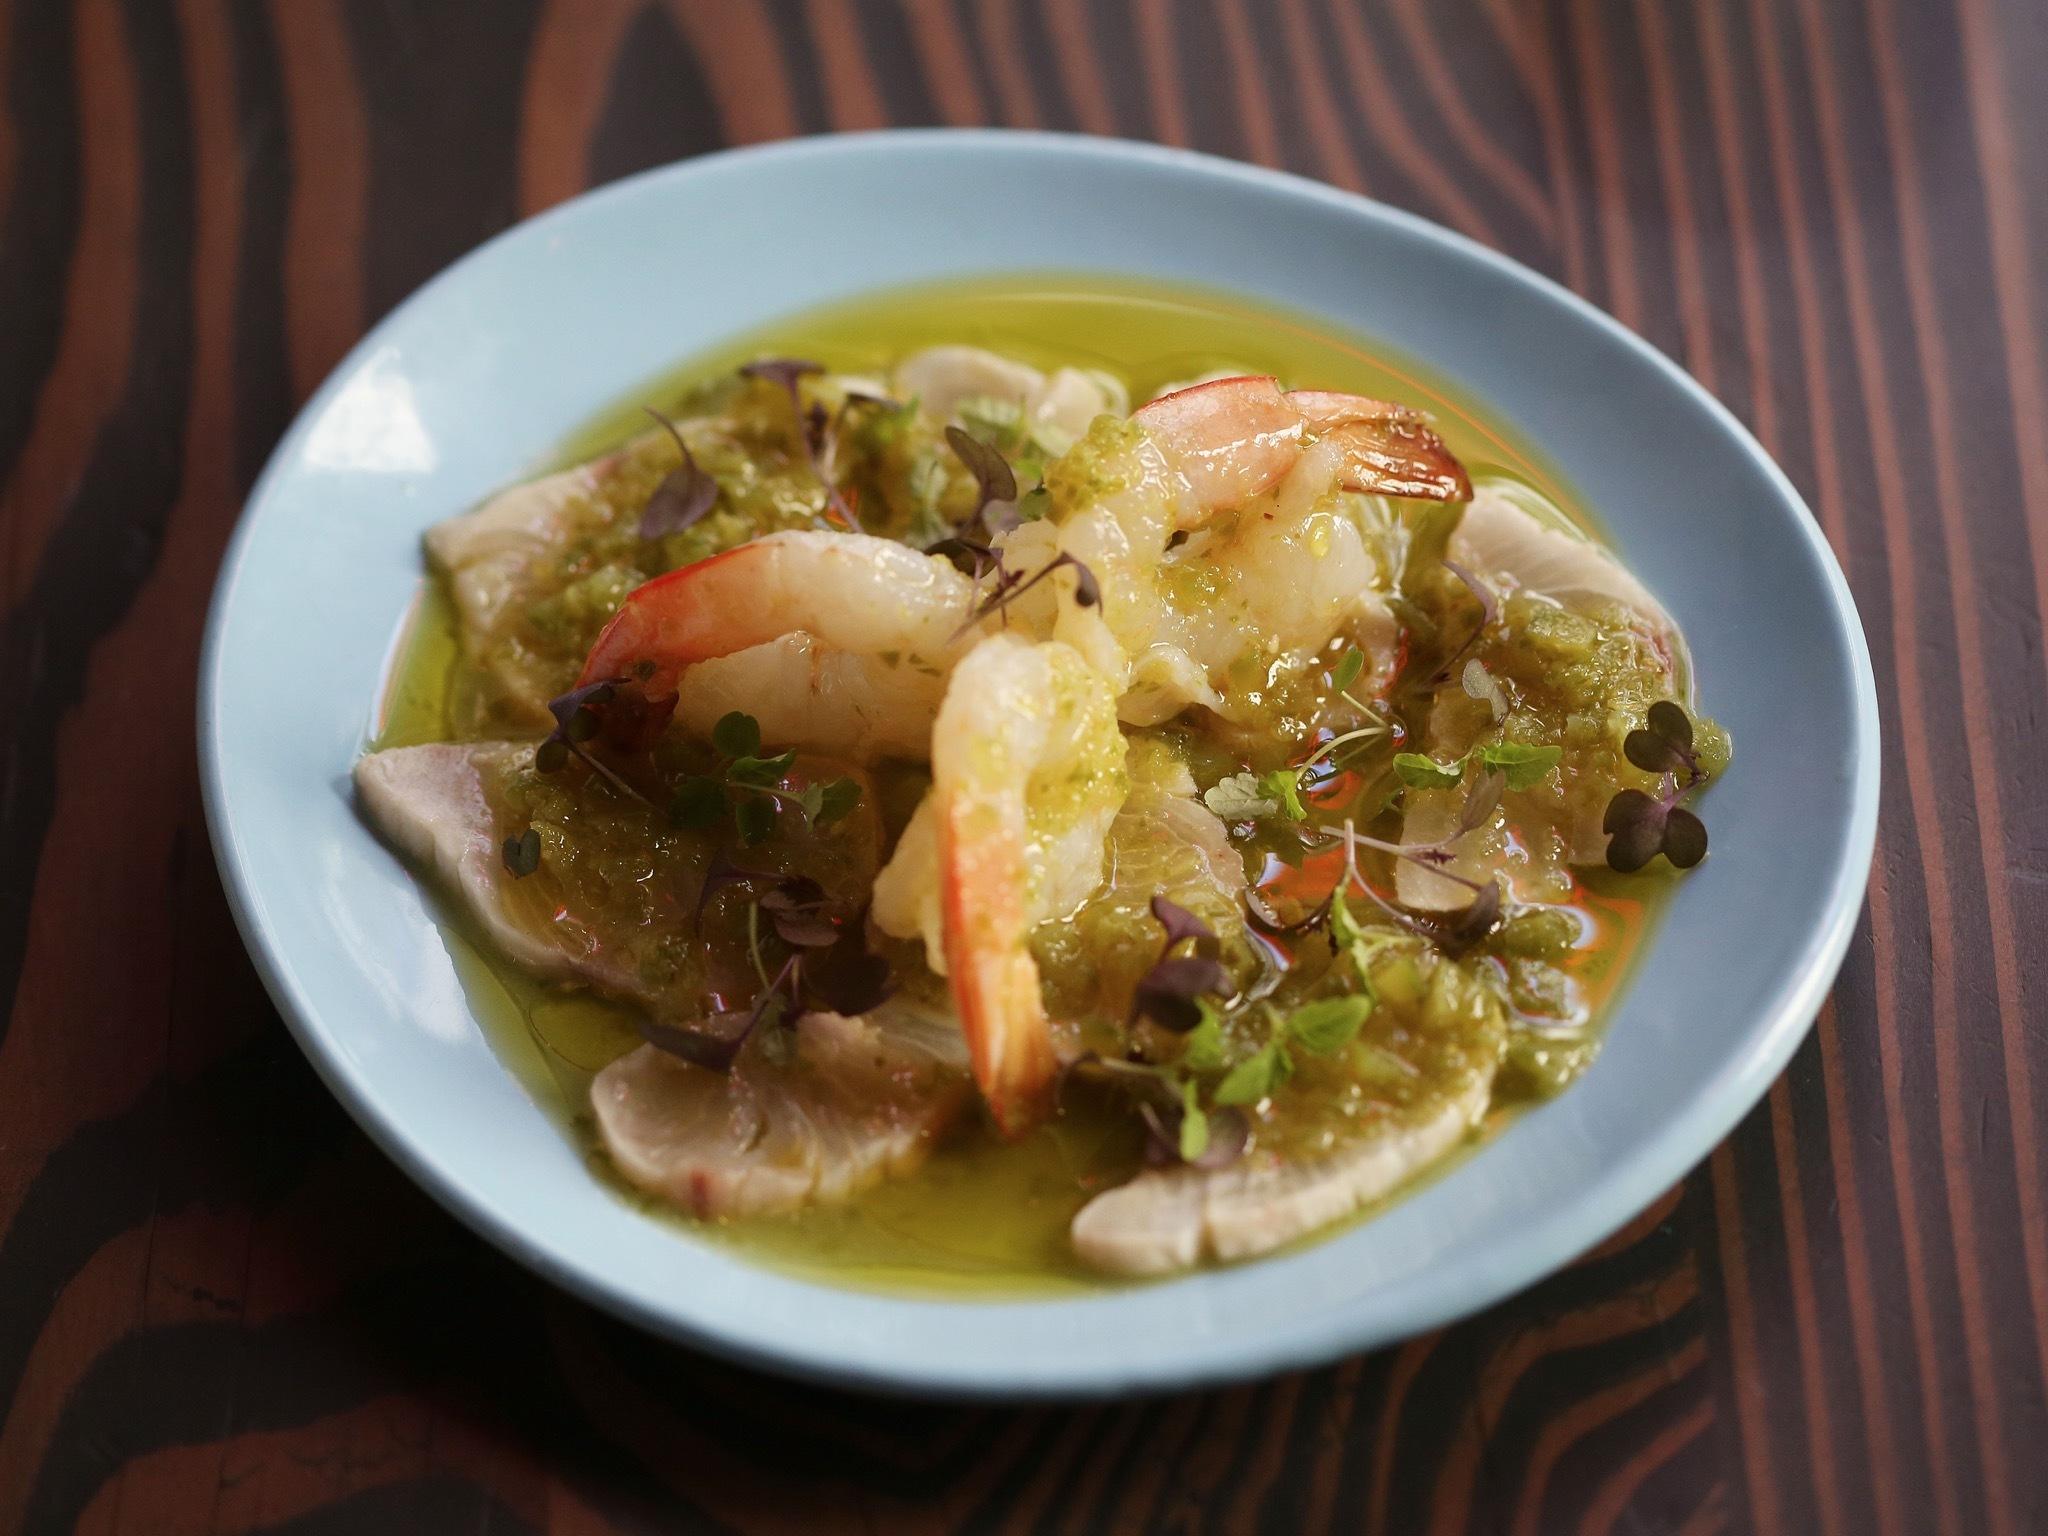 A dish of Green Prawns, Cured Kingfish, Bitter Melon, Lemongrass